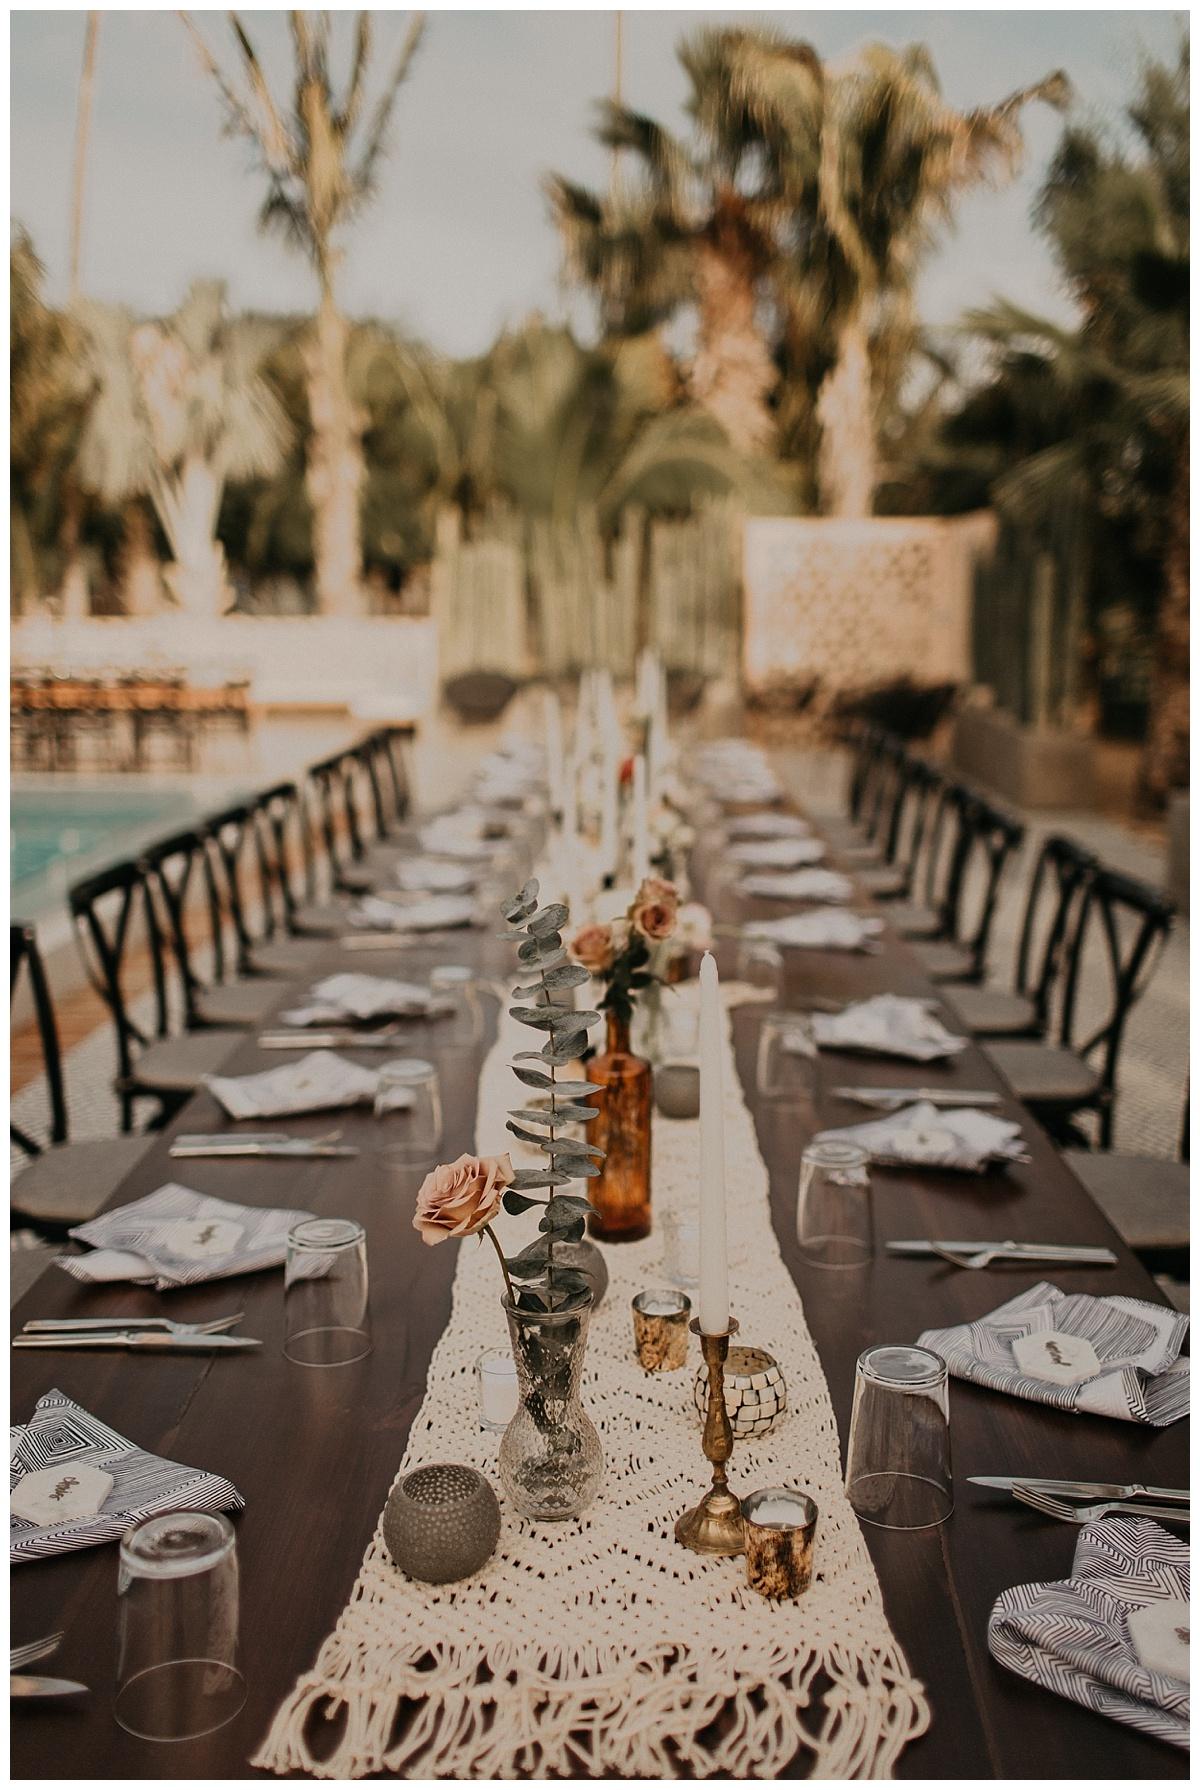 Bixby+Pine-PNW-Wedding-Planners-And-Designers_1617.jpg